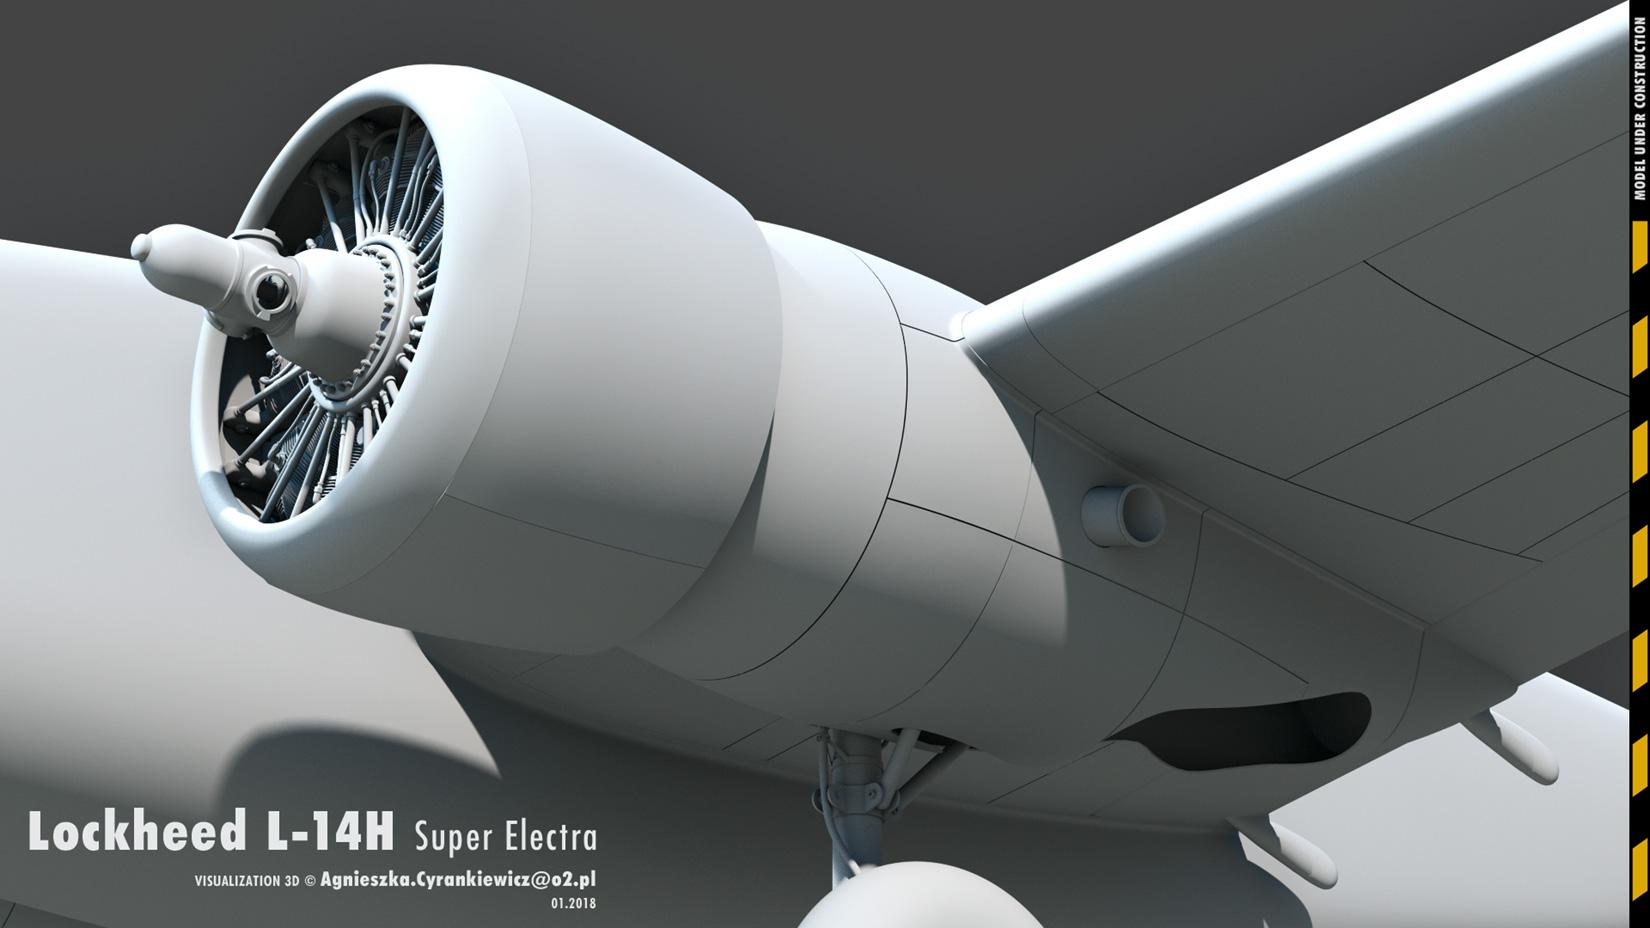 Lockheed Model 14 Super Electra, lockheed hudson, render, 3D, graphics, graphic, Mac Pro